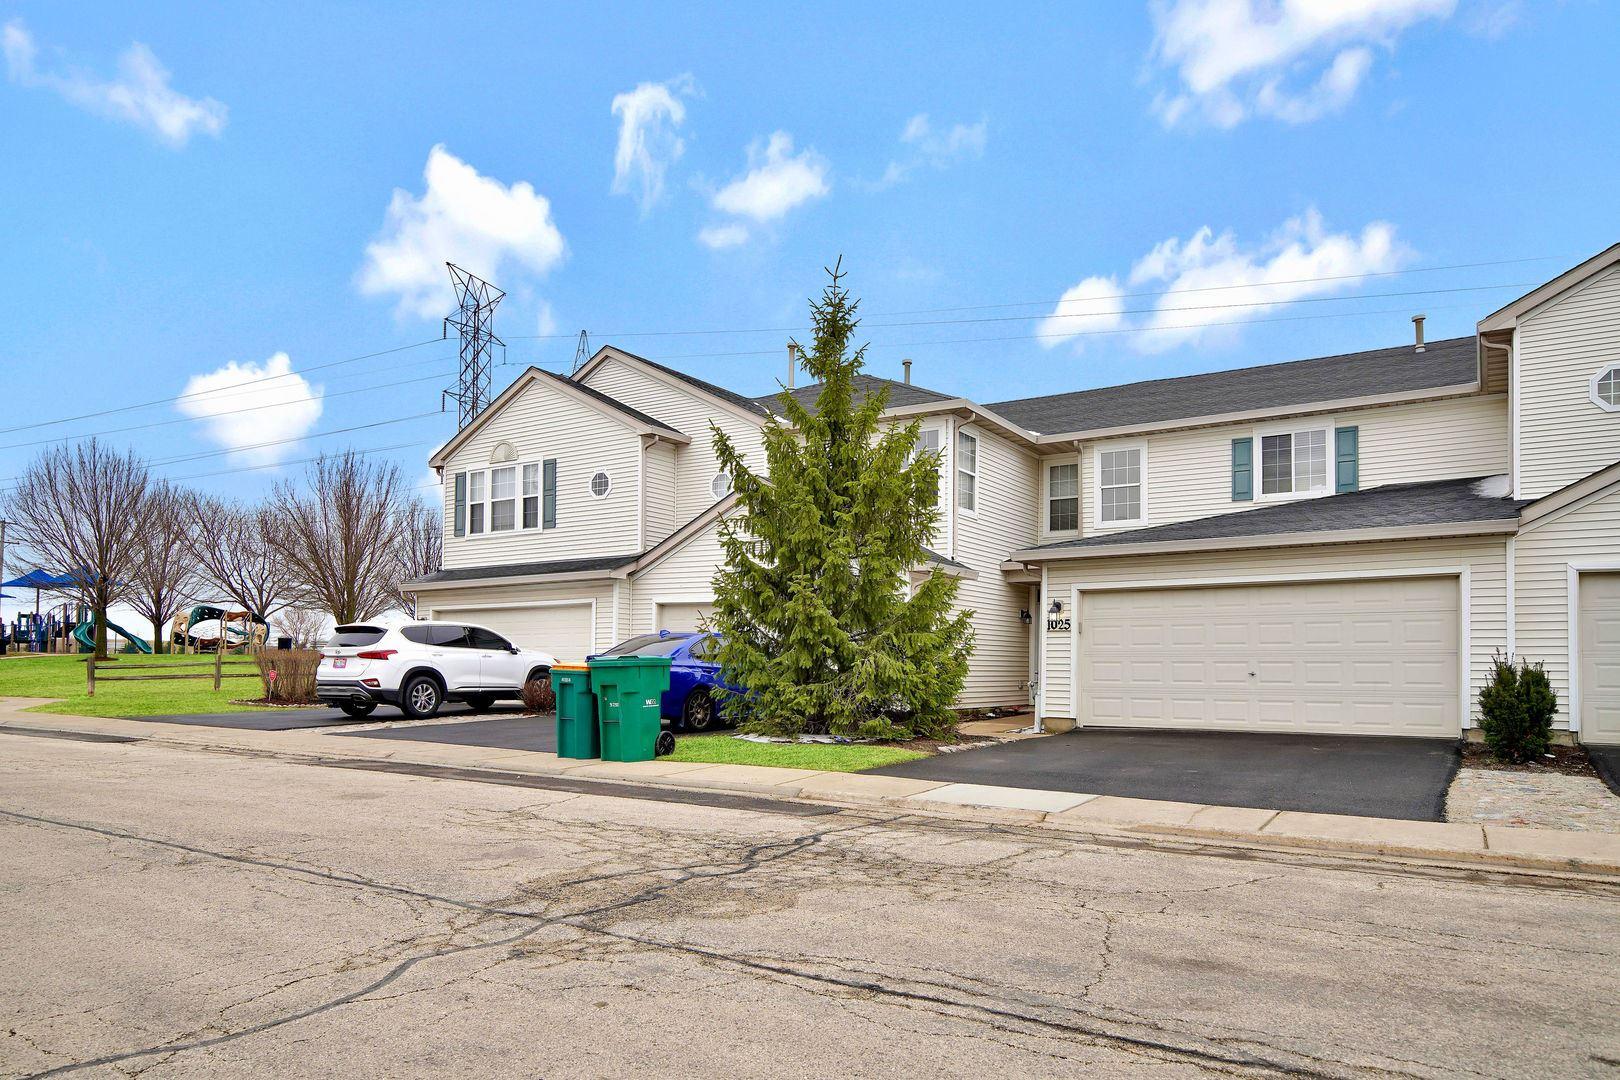 Photo of 1025 KEY LARGO Drive, Romeoville, IL 60446 (MLS # 11025918)